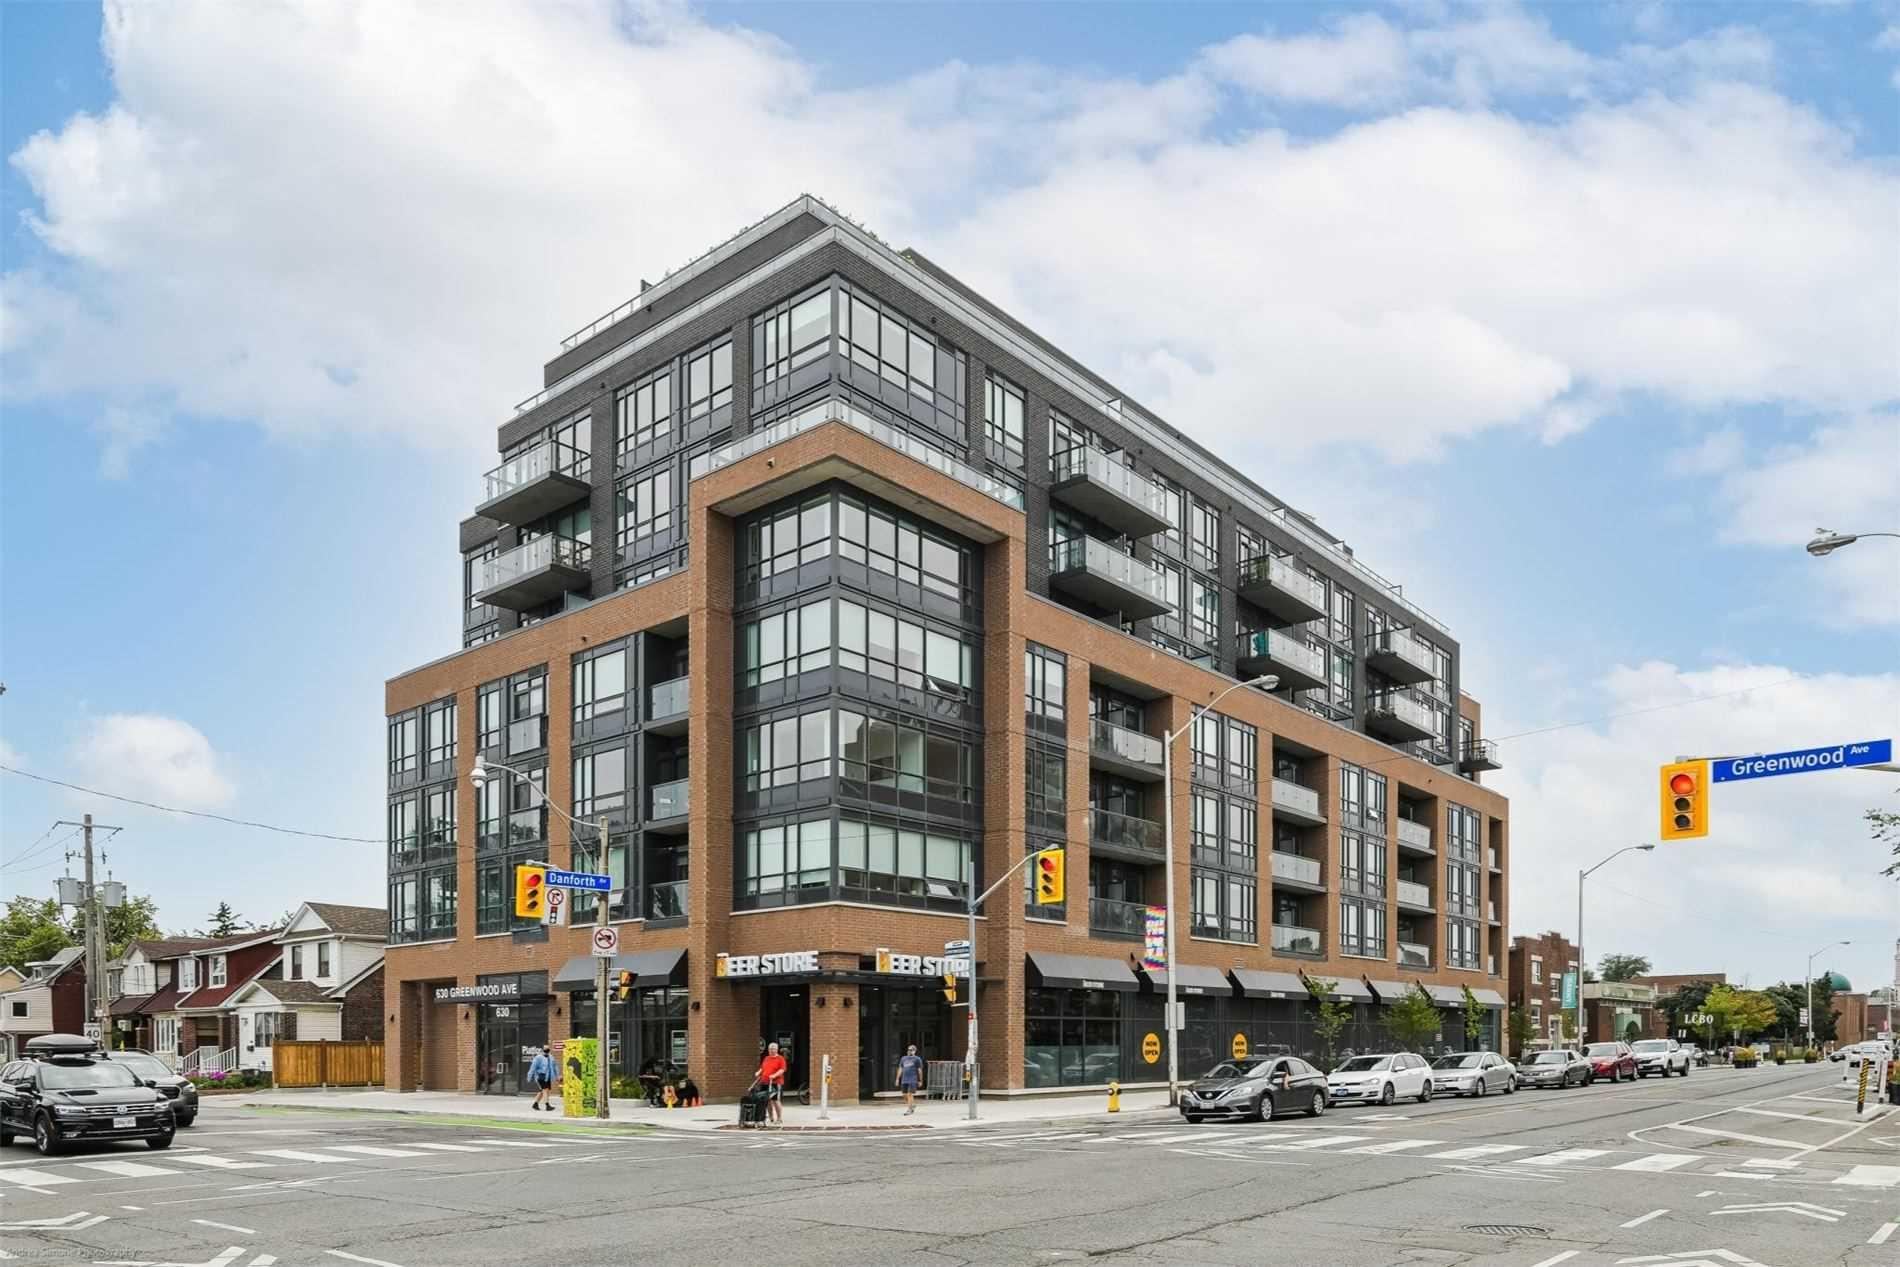 806 - 630 Greenwood Ave, Toronto, M4J0A8